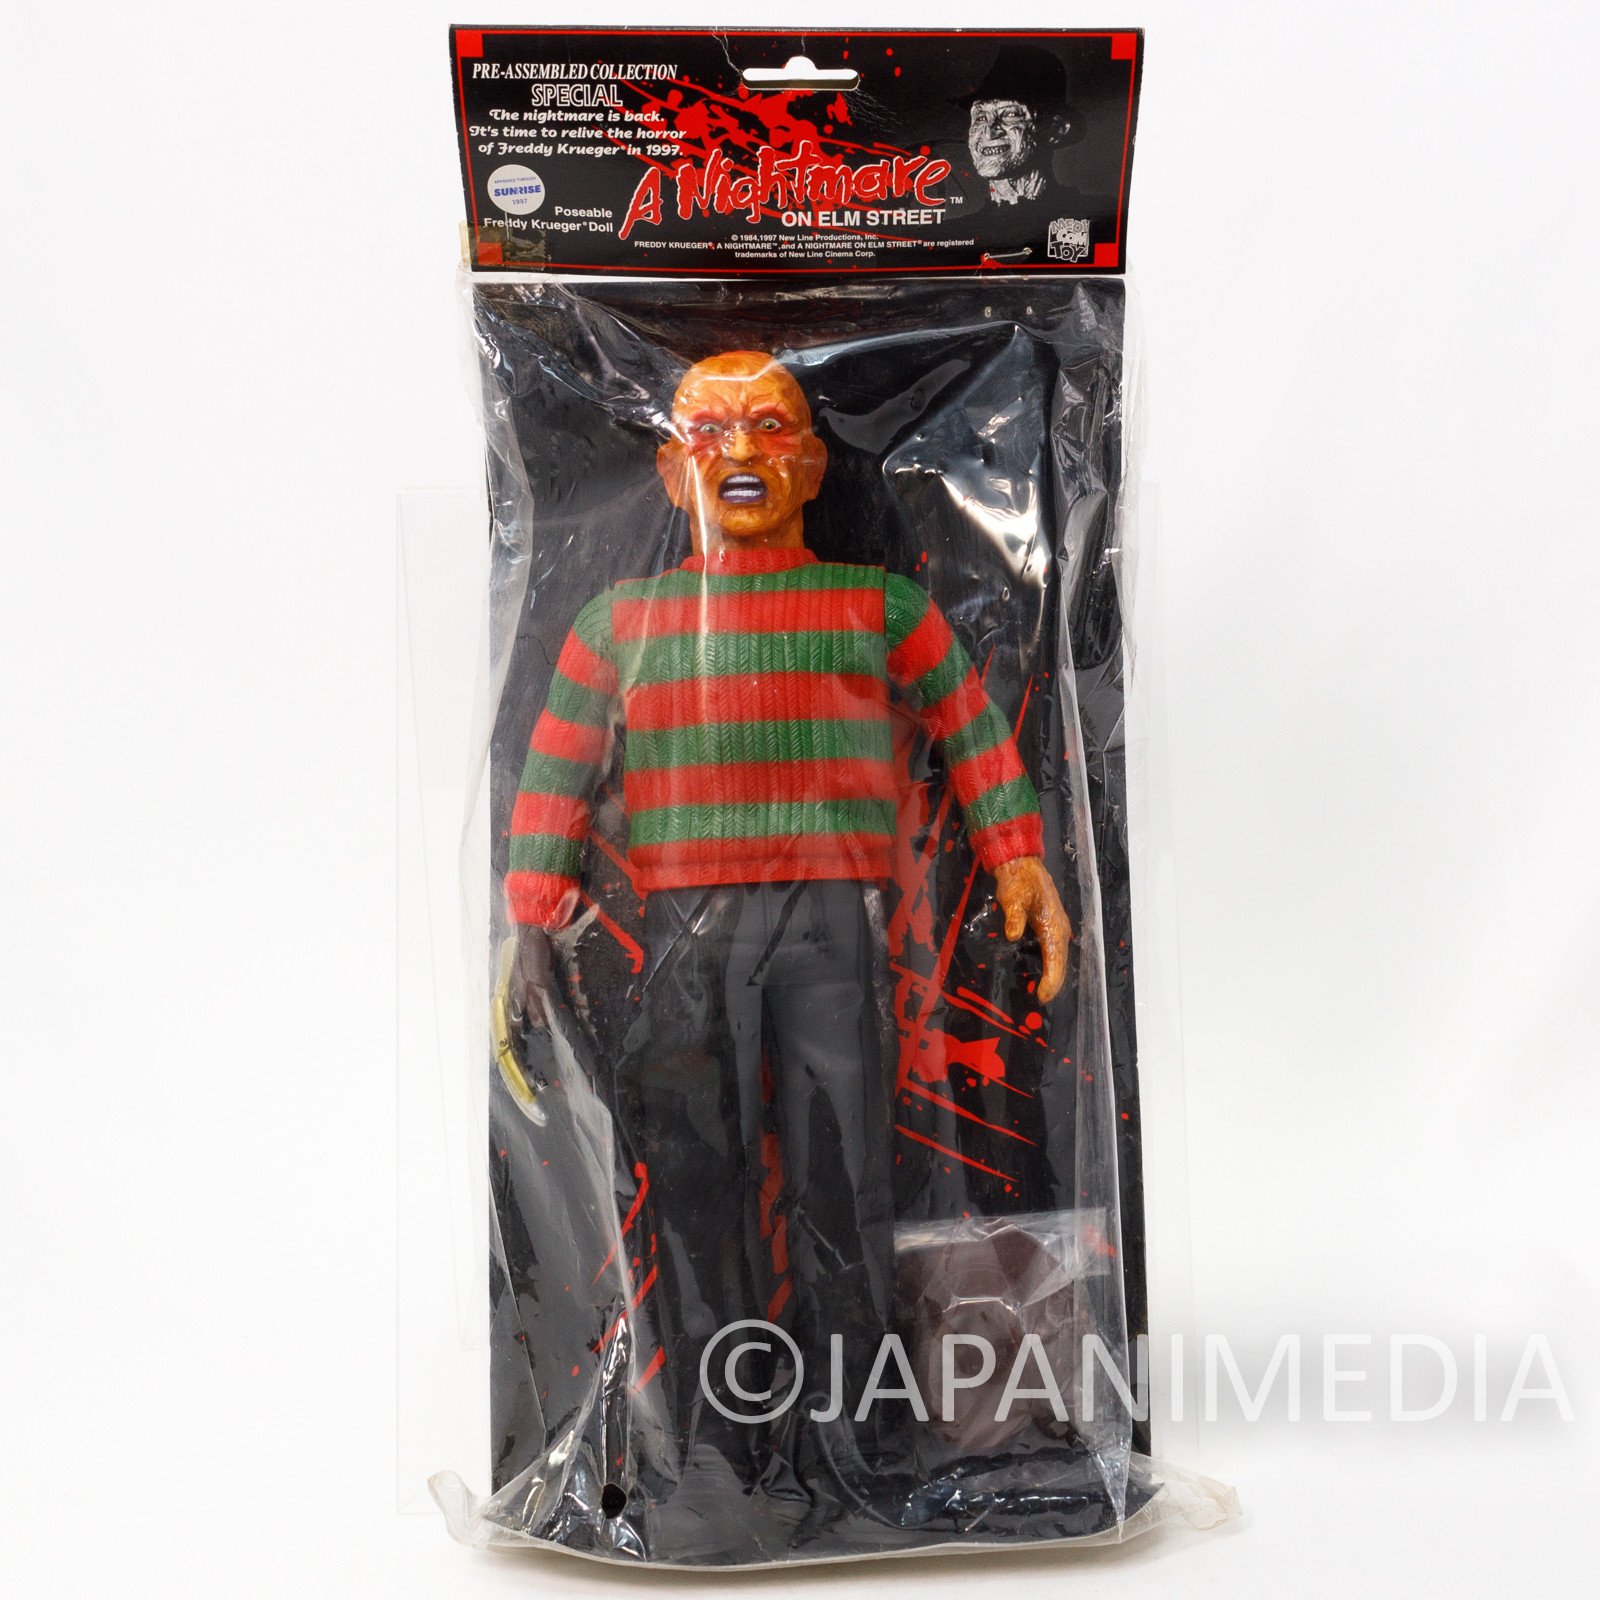 "A Nightmare on Elm Street FREDDY KRUEGER 12"" Soft Vinyl Figure Medicom Toy"